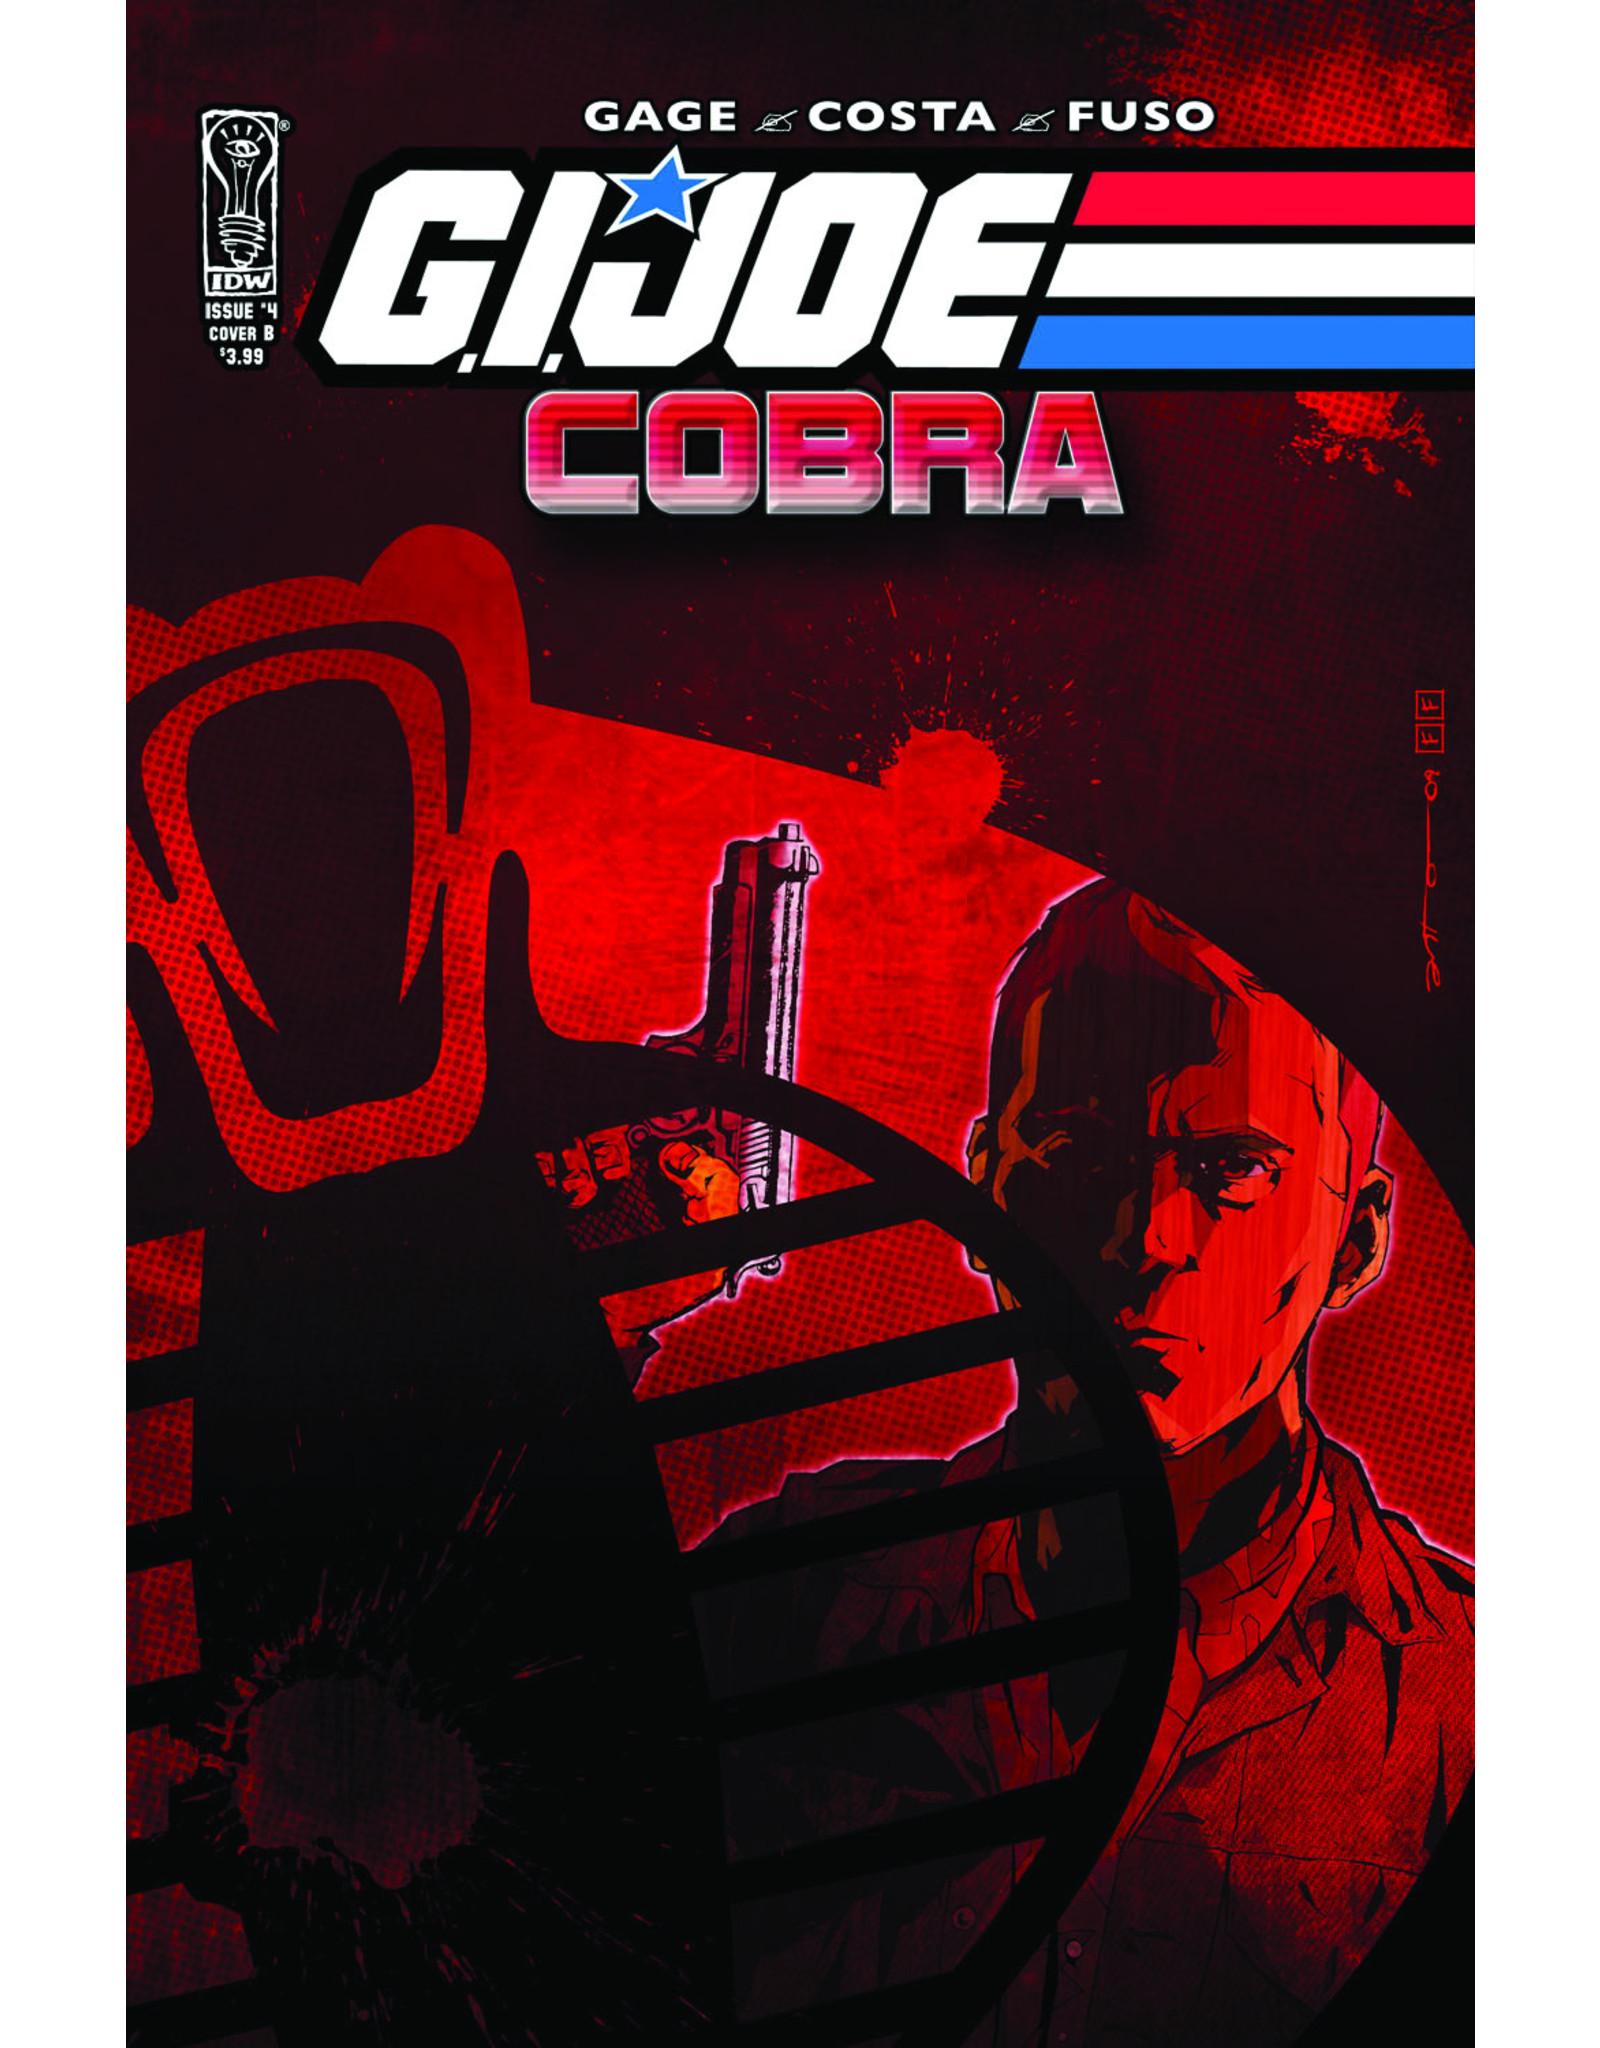 IDW PUBLISHING GI JOE COBRA TP VOL 01